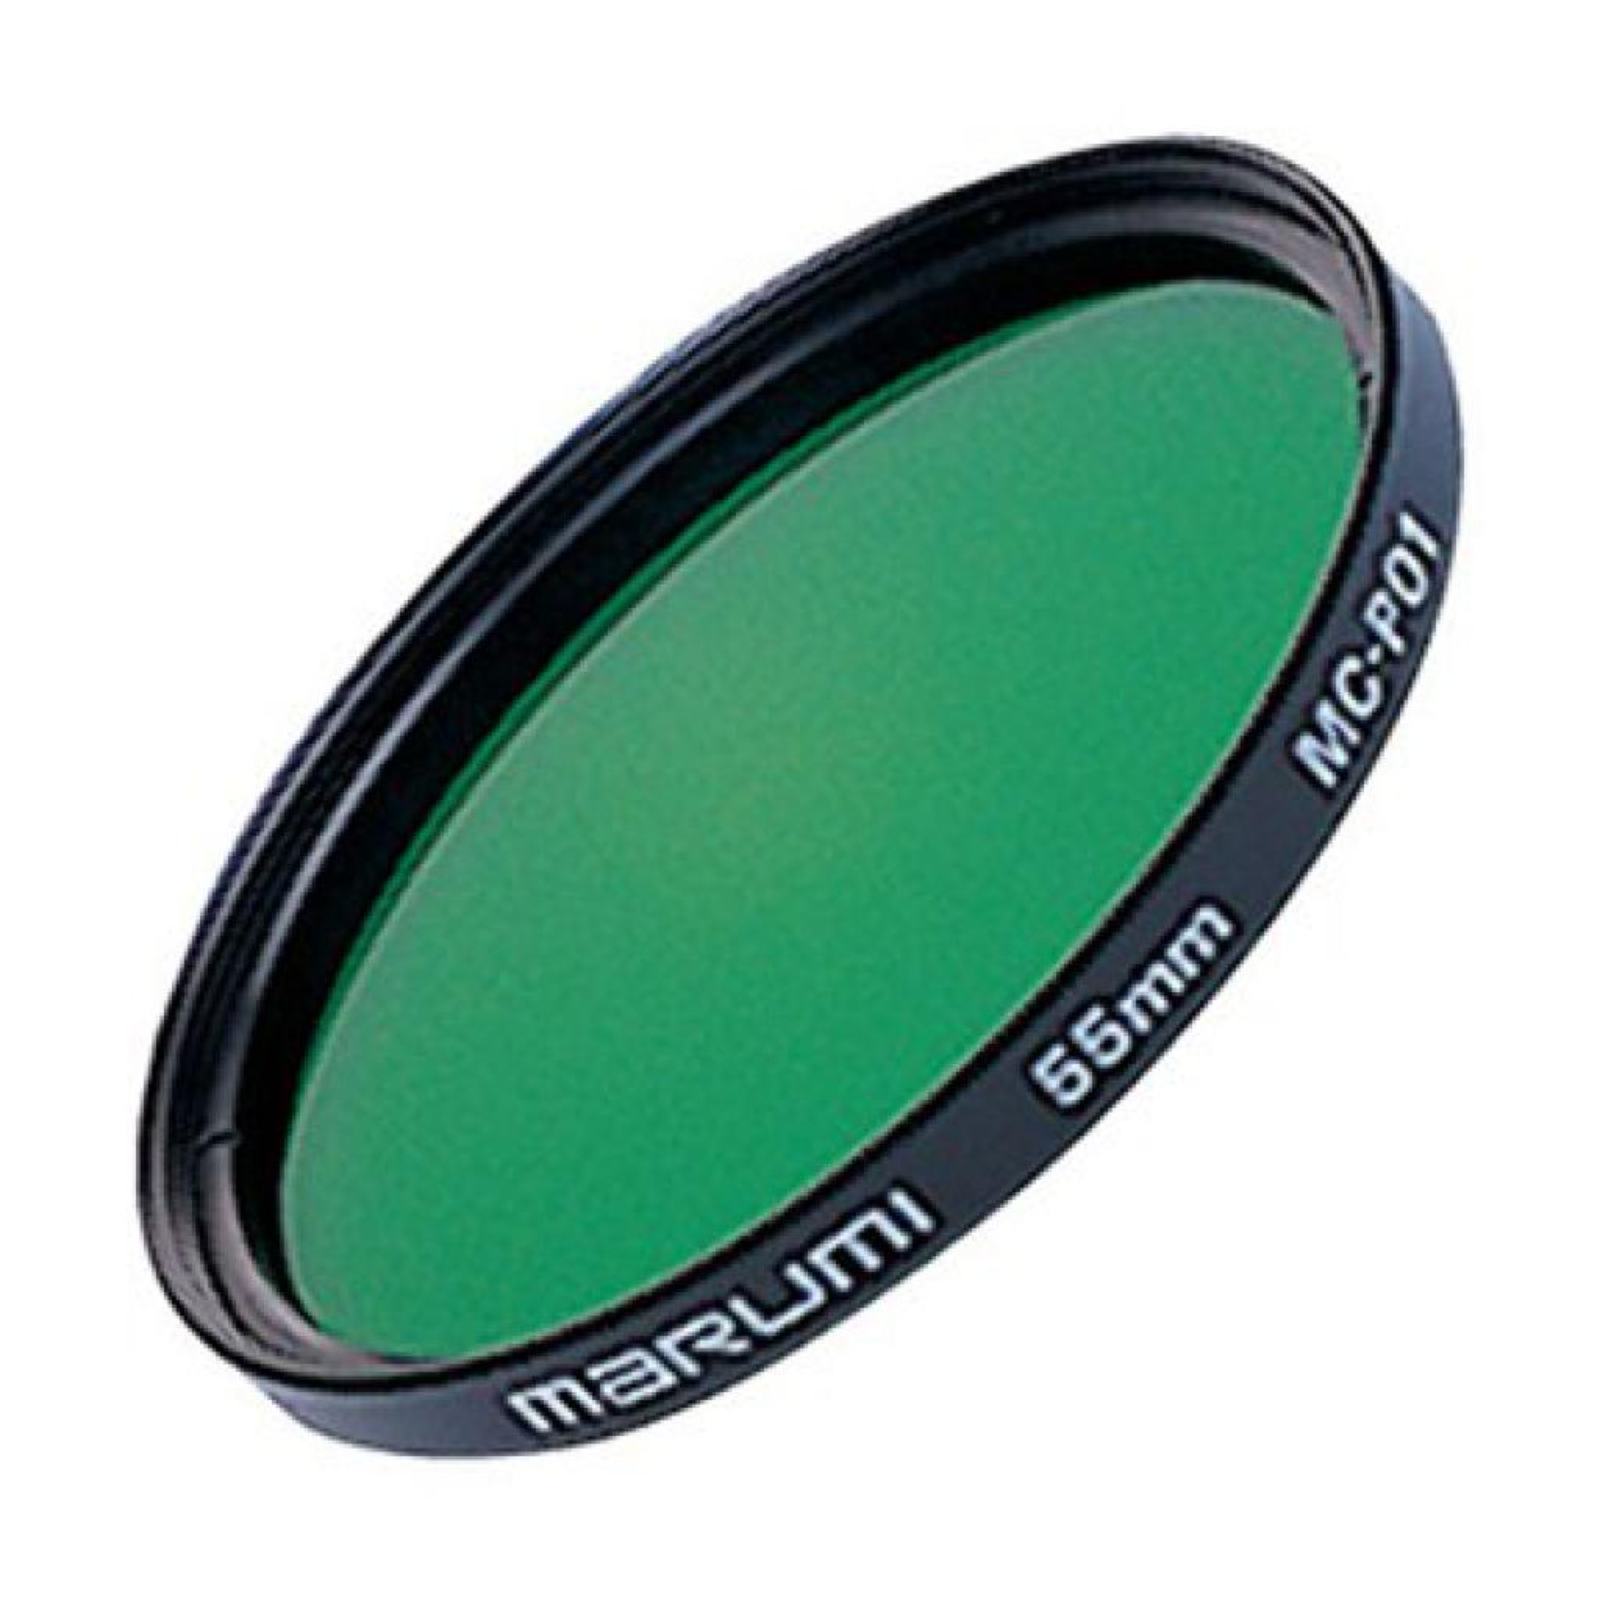 Светофильтр Marumi PO1 (green) 55mm